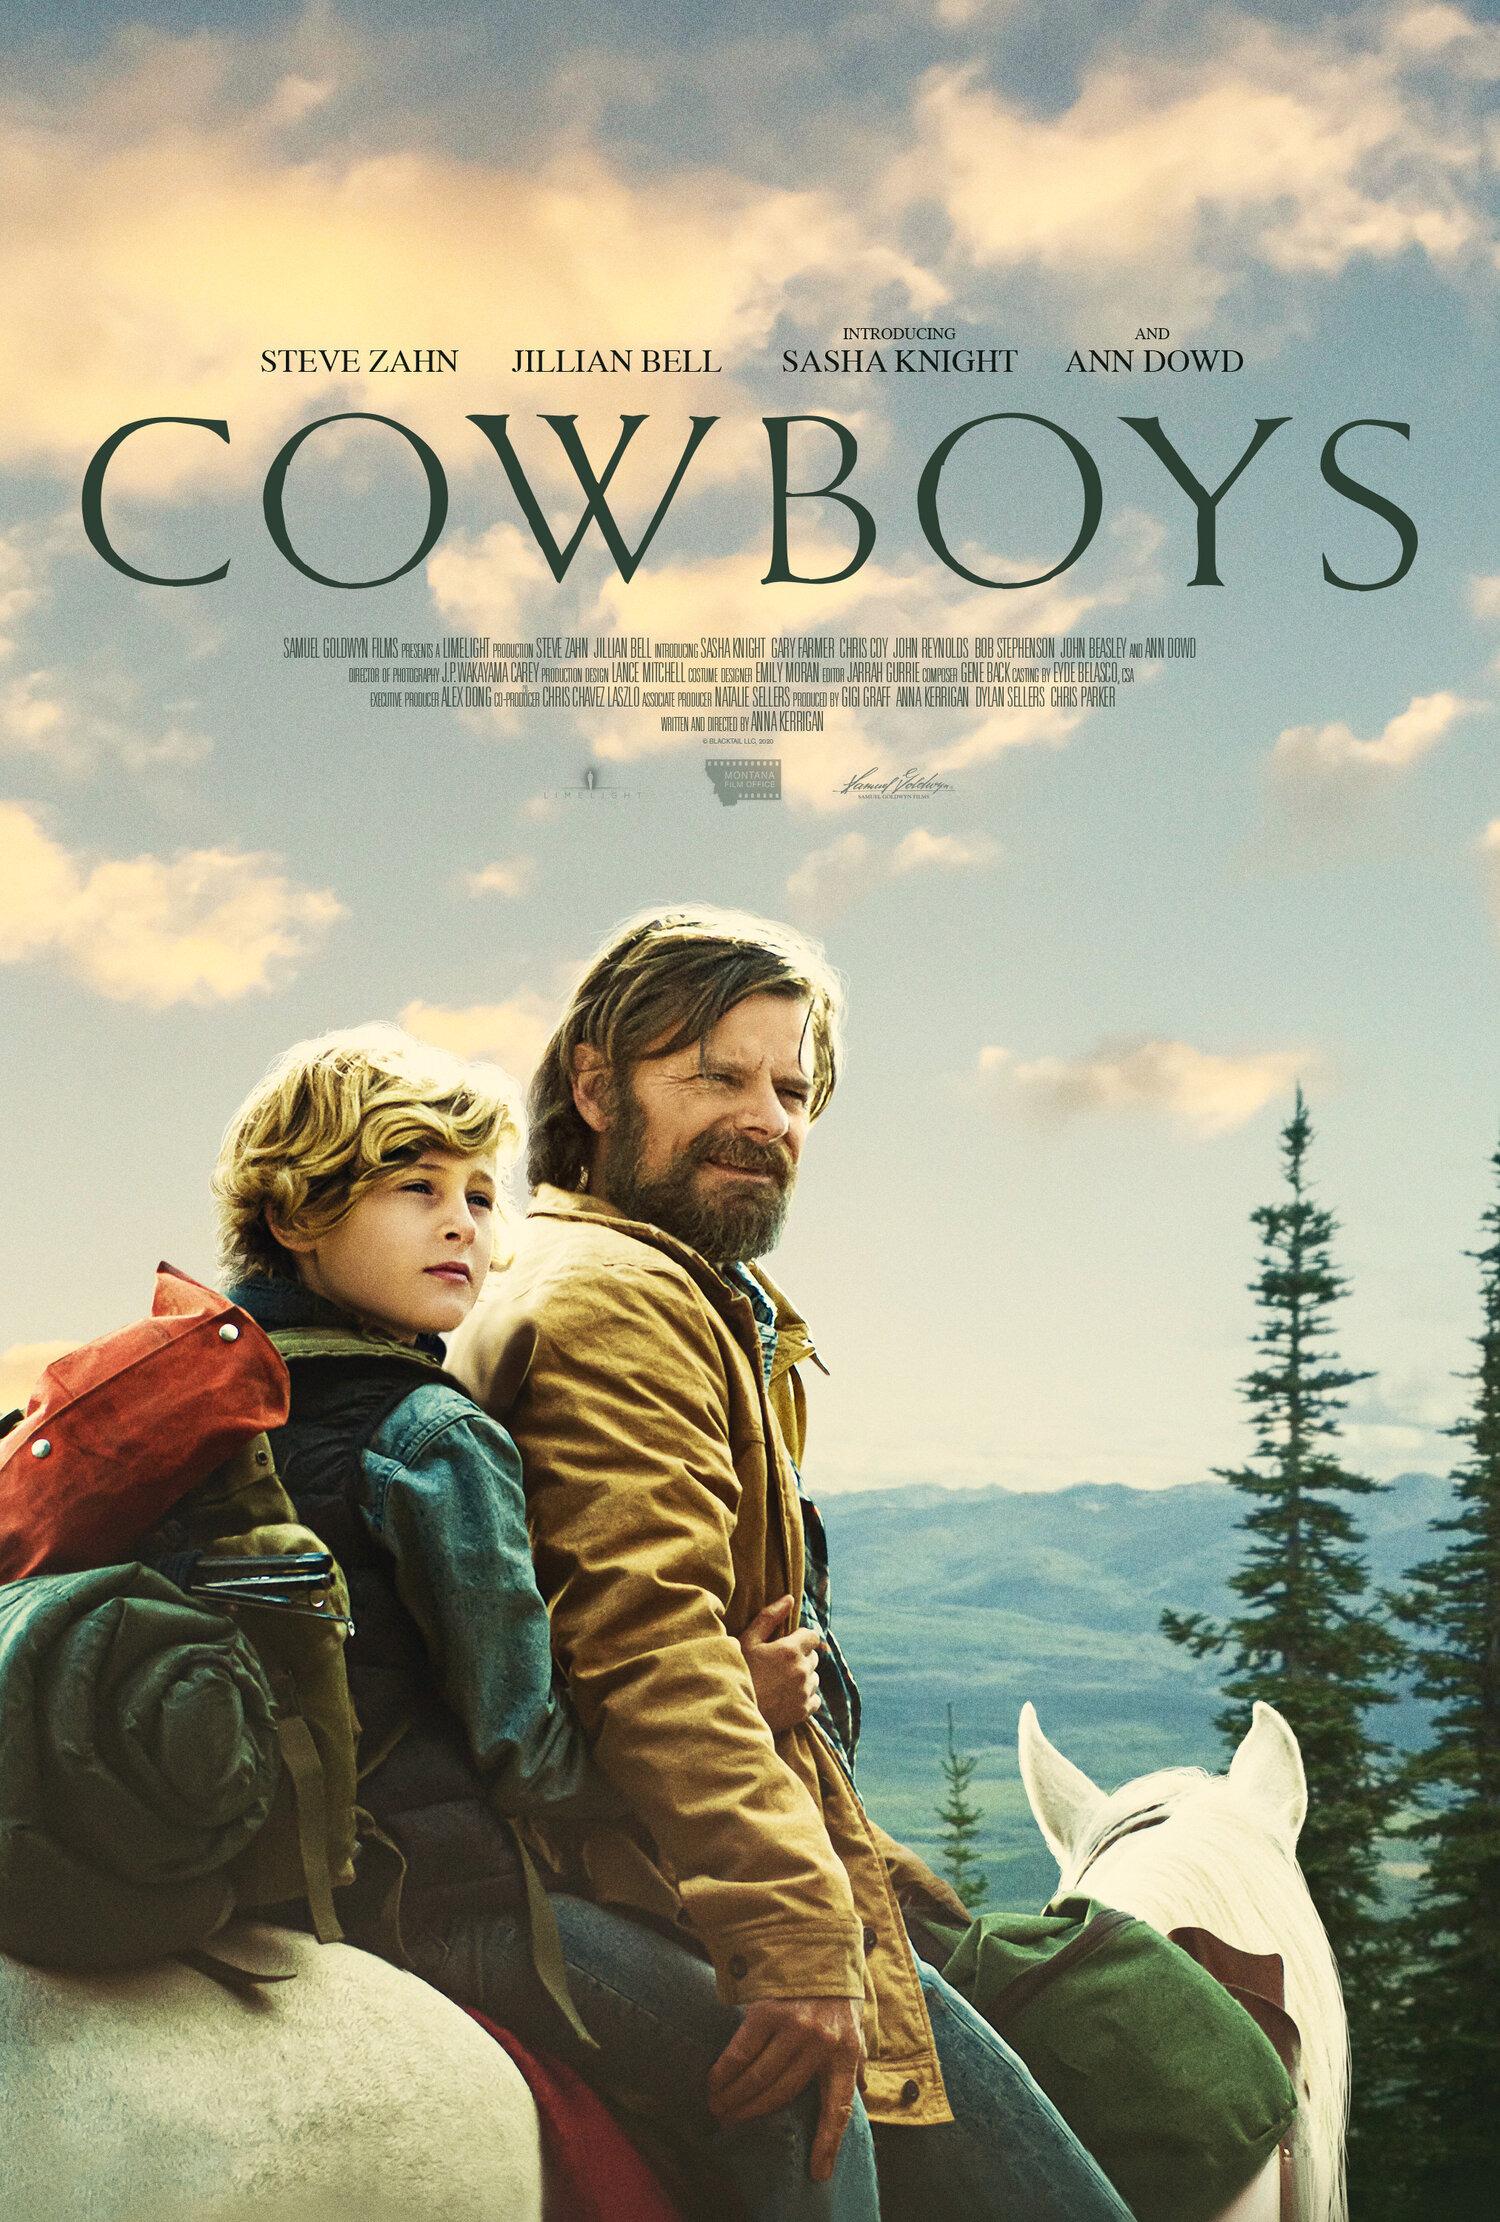 Download Filme Cowboys Torrent 2021 Qualidade Hd